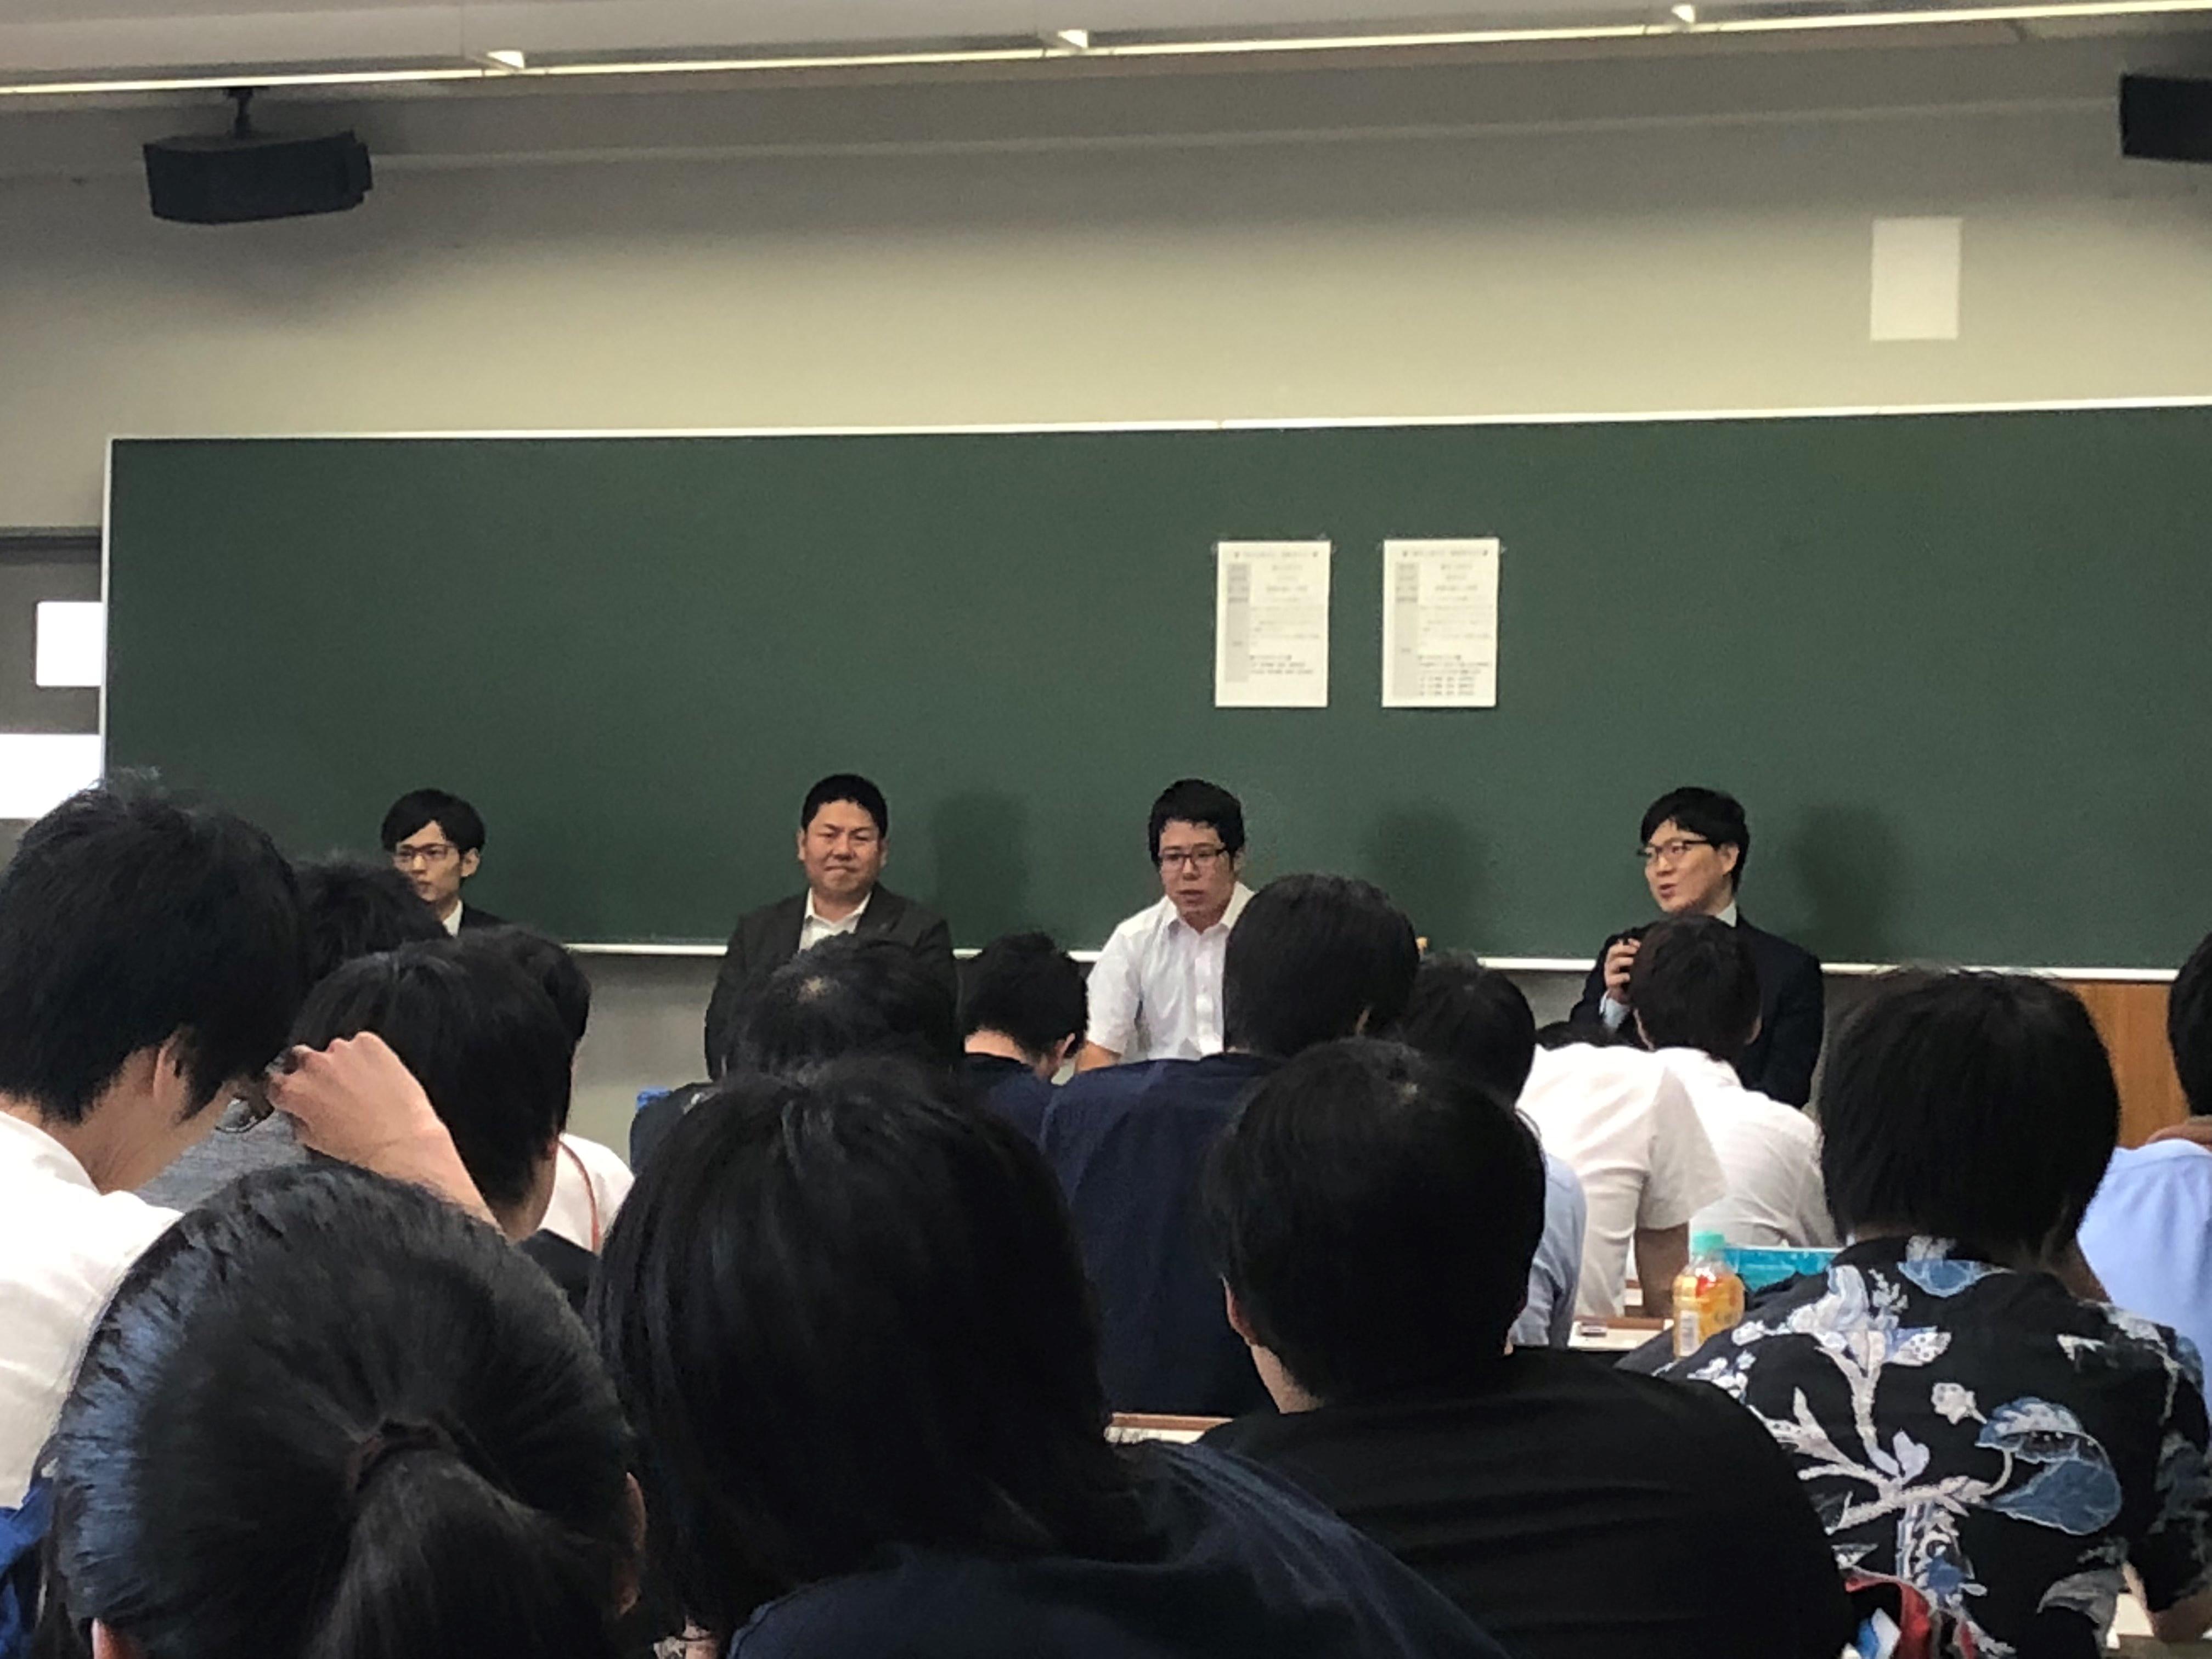 http://d-club.koudai-kai.jp/news/uploads/2018/%E7%84%A1%E9%A1%8C.png